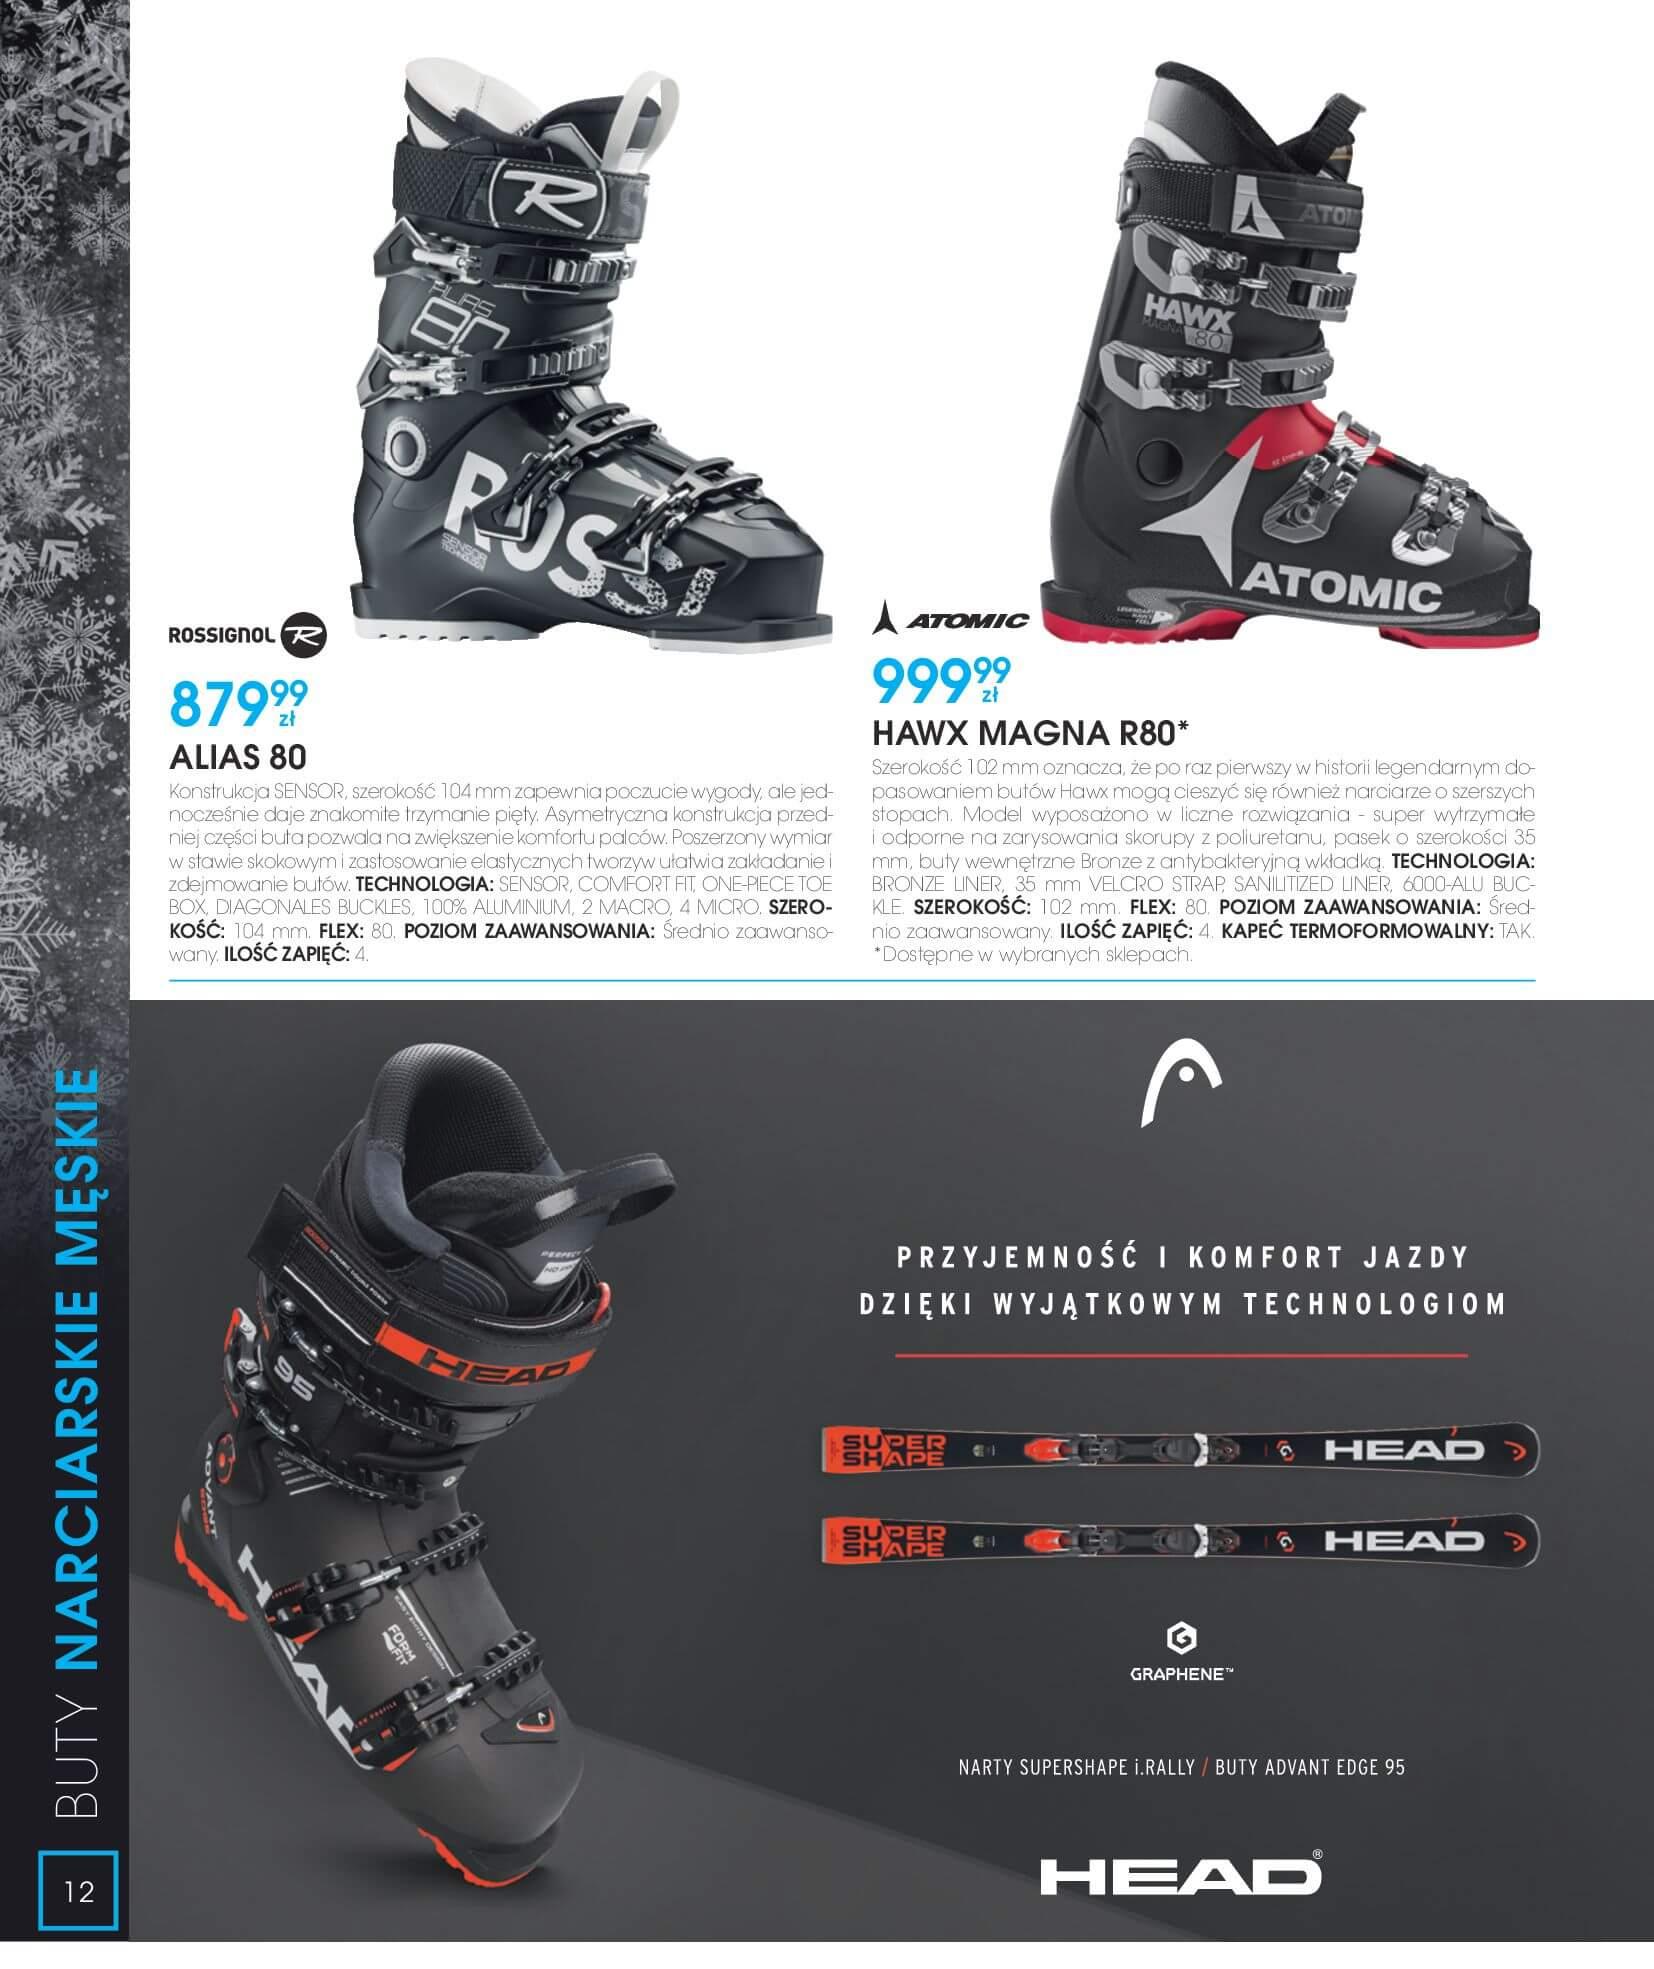 Gazetka Go Sport - Katalog Zima 2017/2018-12.11.2017-28.02.2018-page-12